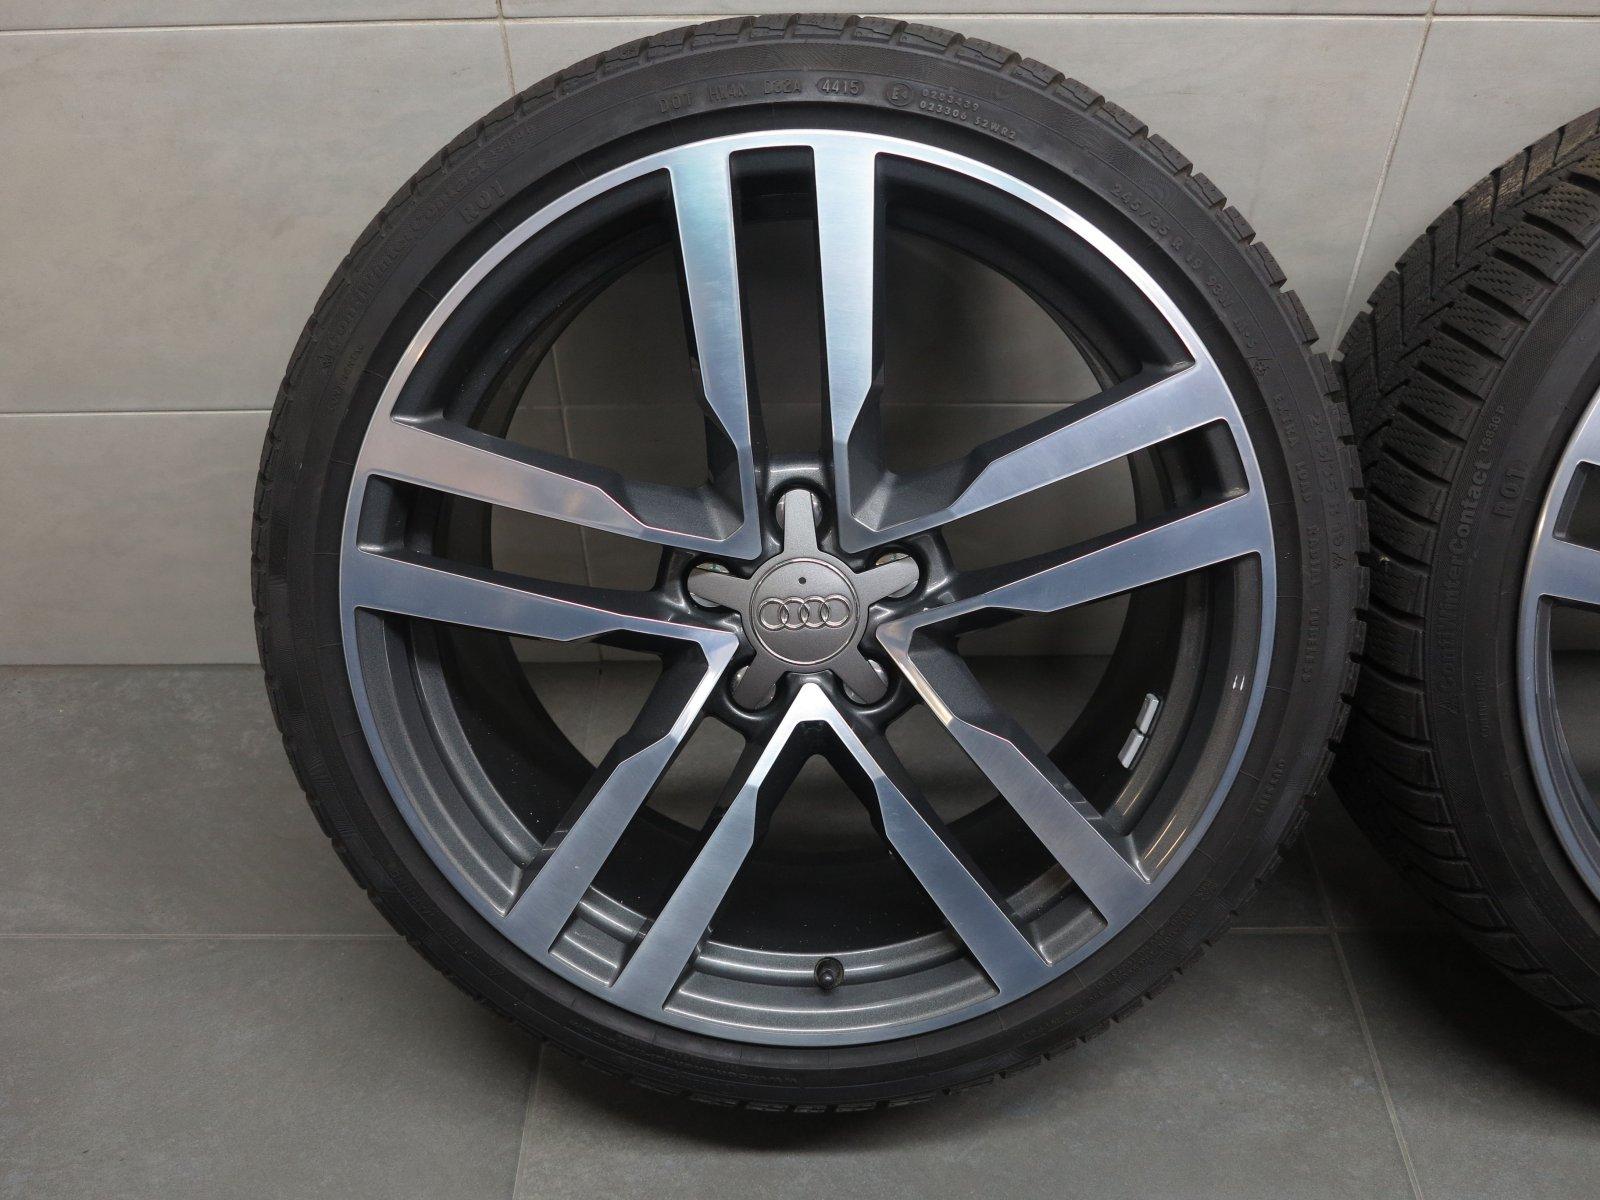 19 inch original winter wheels audi tt tts tt rs roadster rims 8s0601025f zle9 ebay. Black Bedroom Furniture Sets. Home Design Ideas